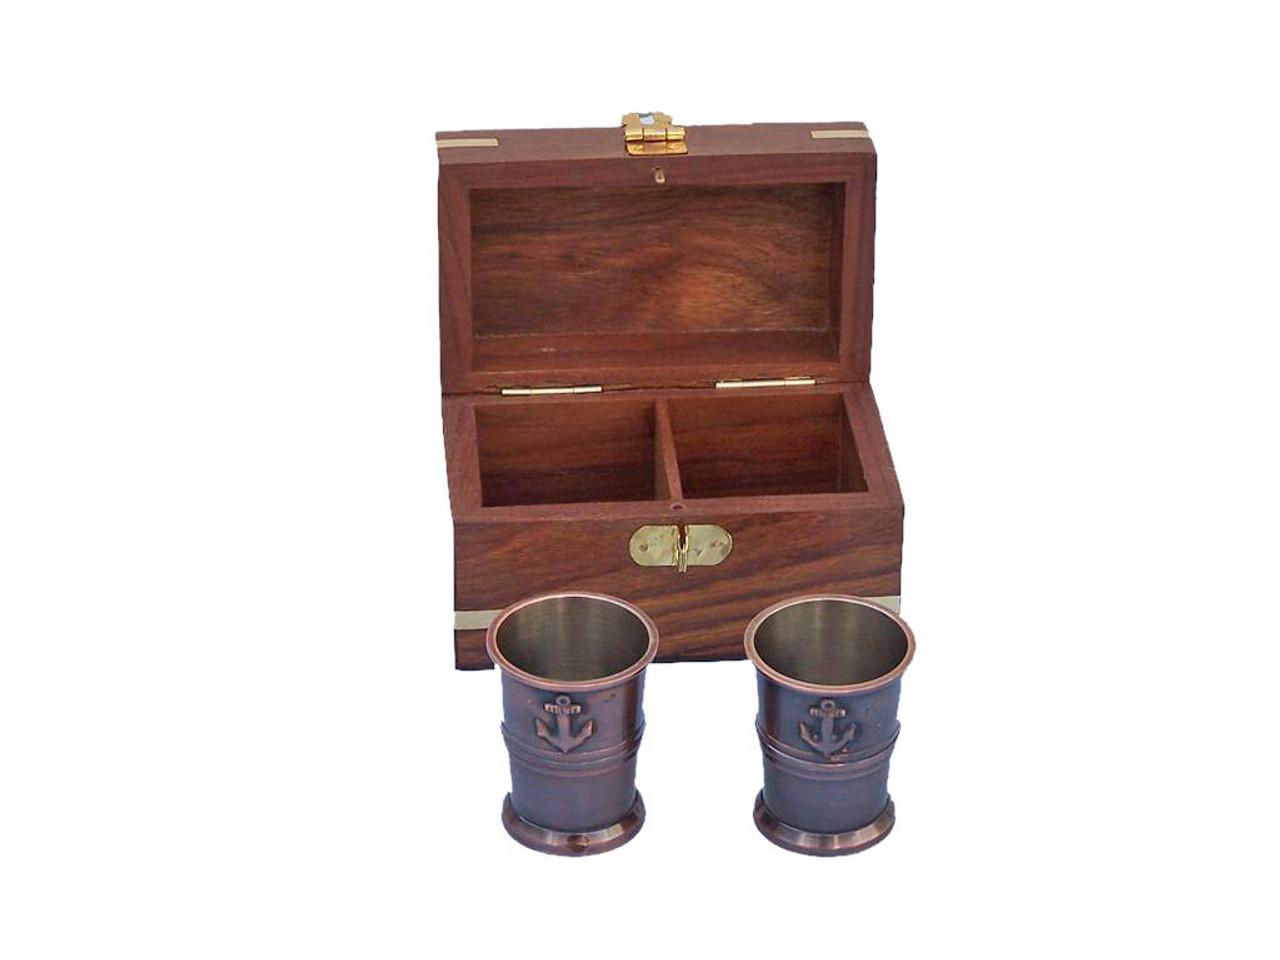 Anchor Shot Glasses Antique Copper Set of 2 Rosewood Case